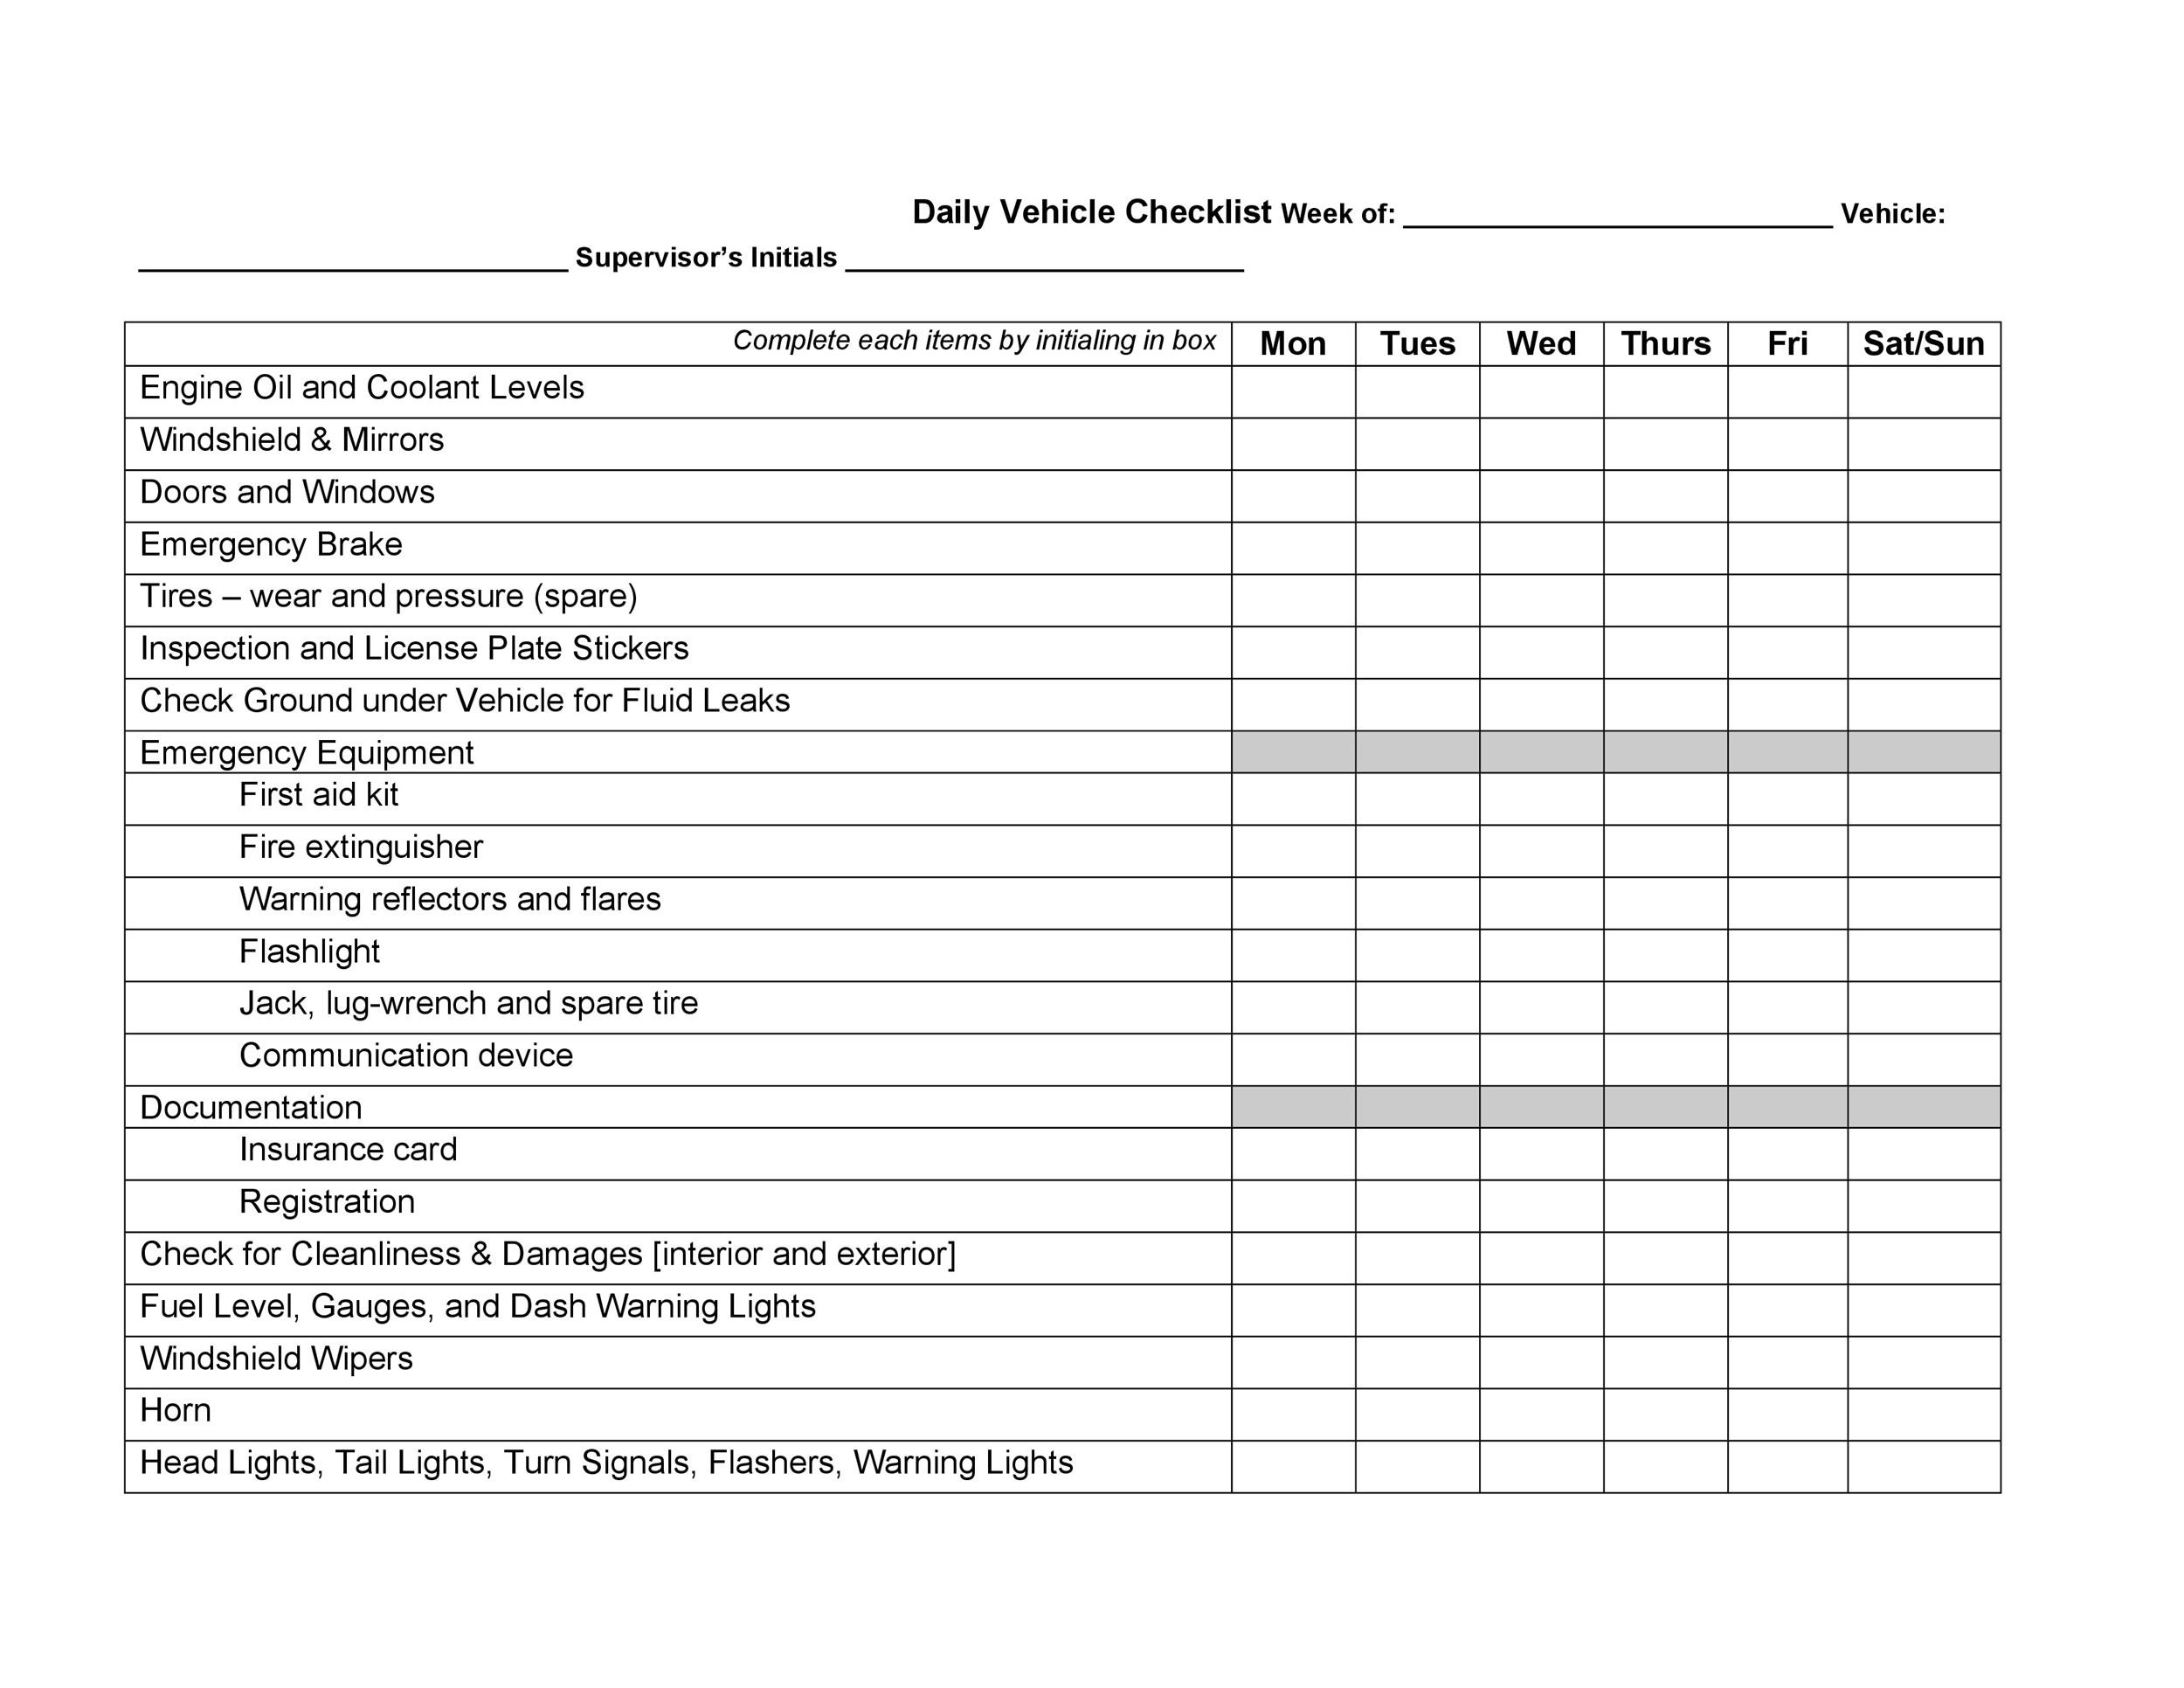 40 Printable Vehicle Maintenance Log Templates - Template Lab